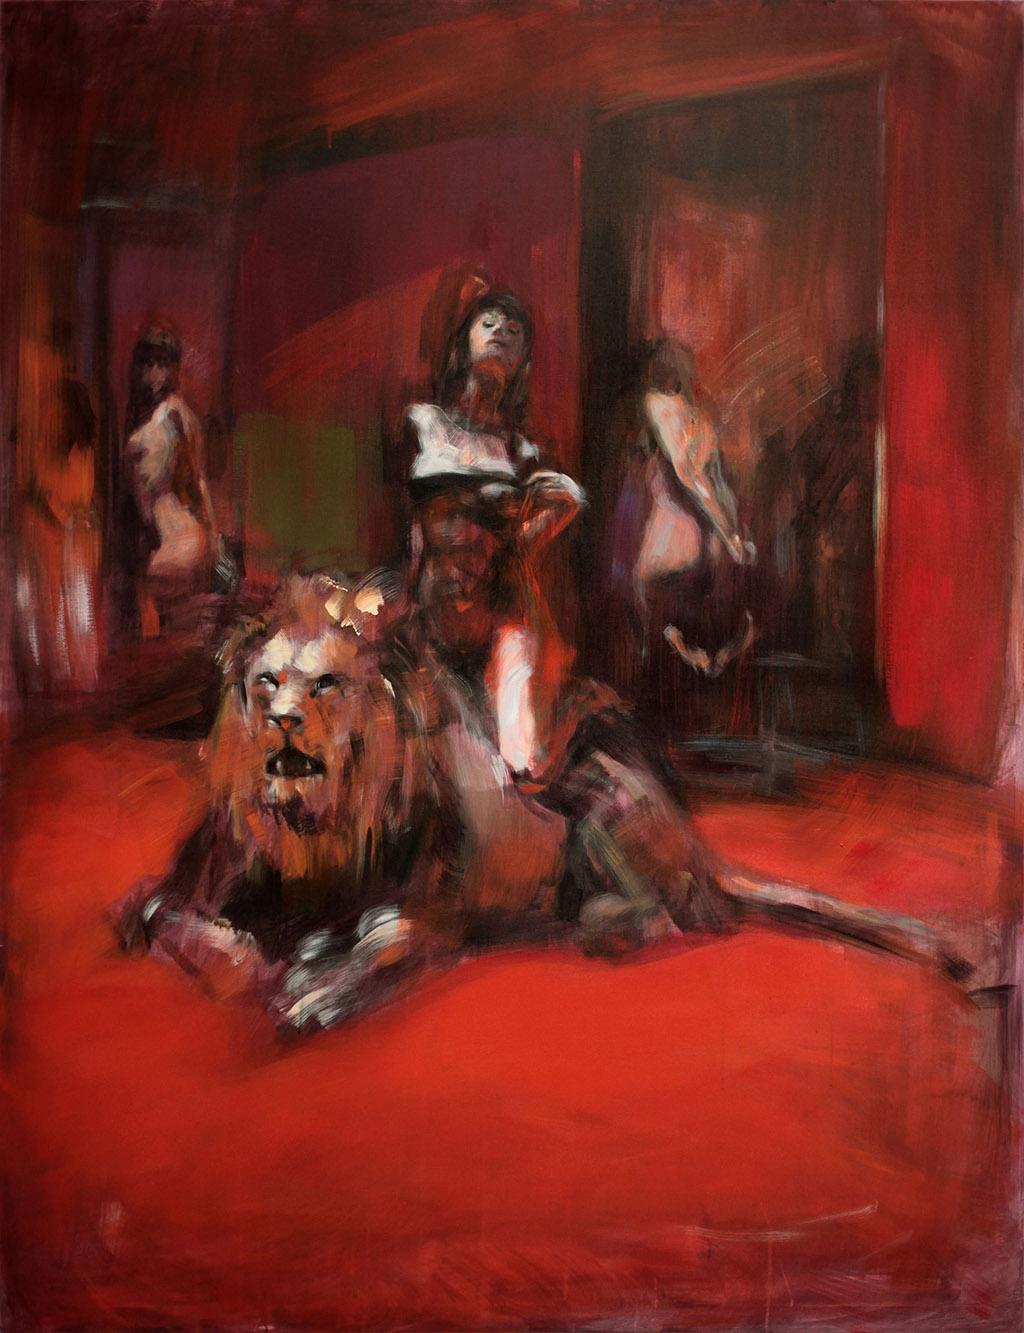 Das Löwenzimmer2013, Acryl/Lwd, 195x155cm